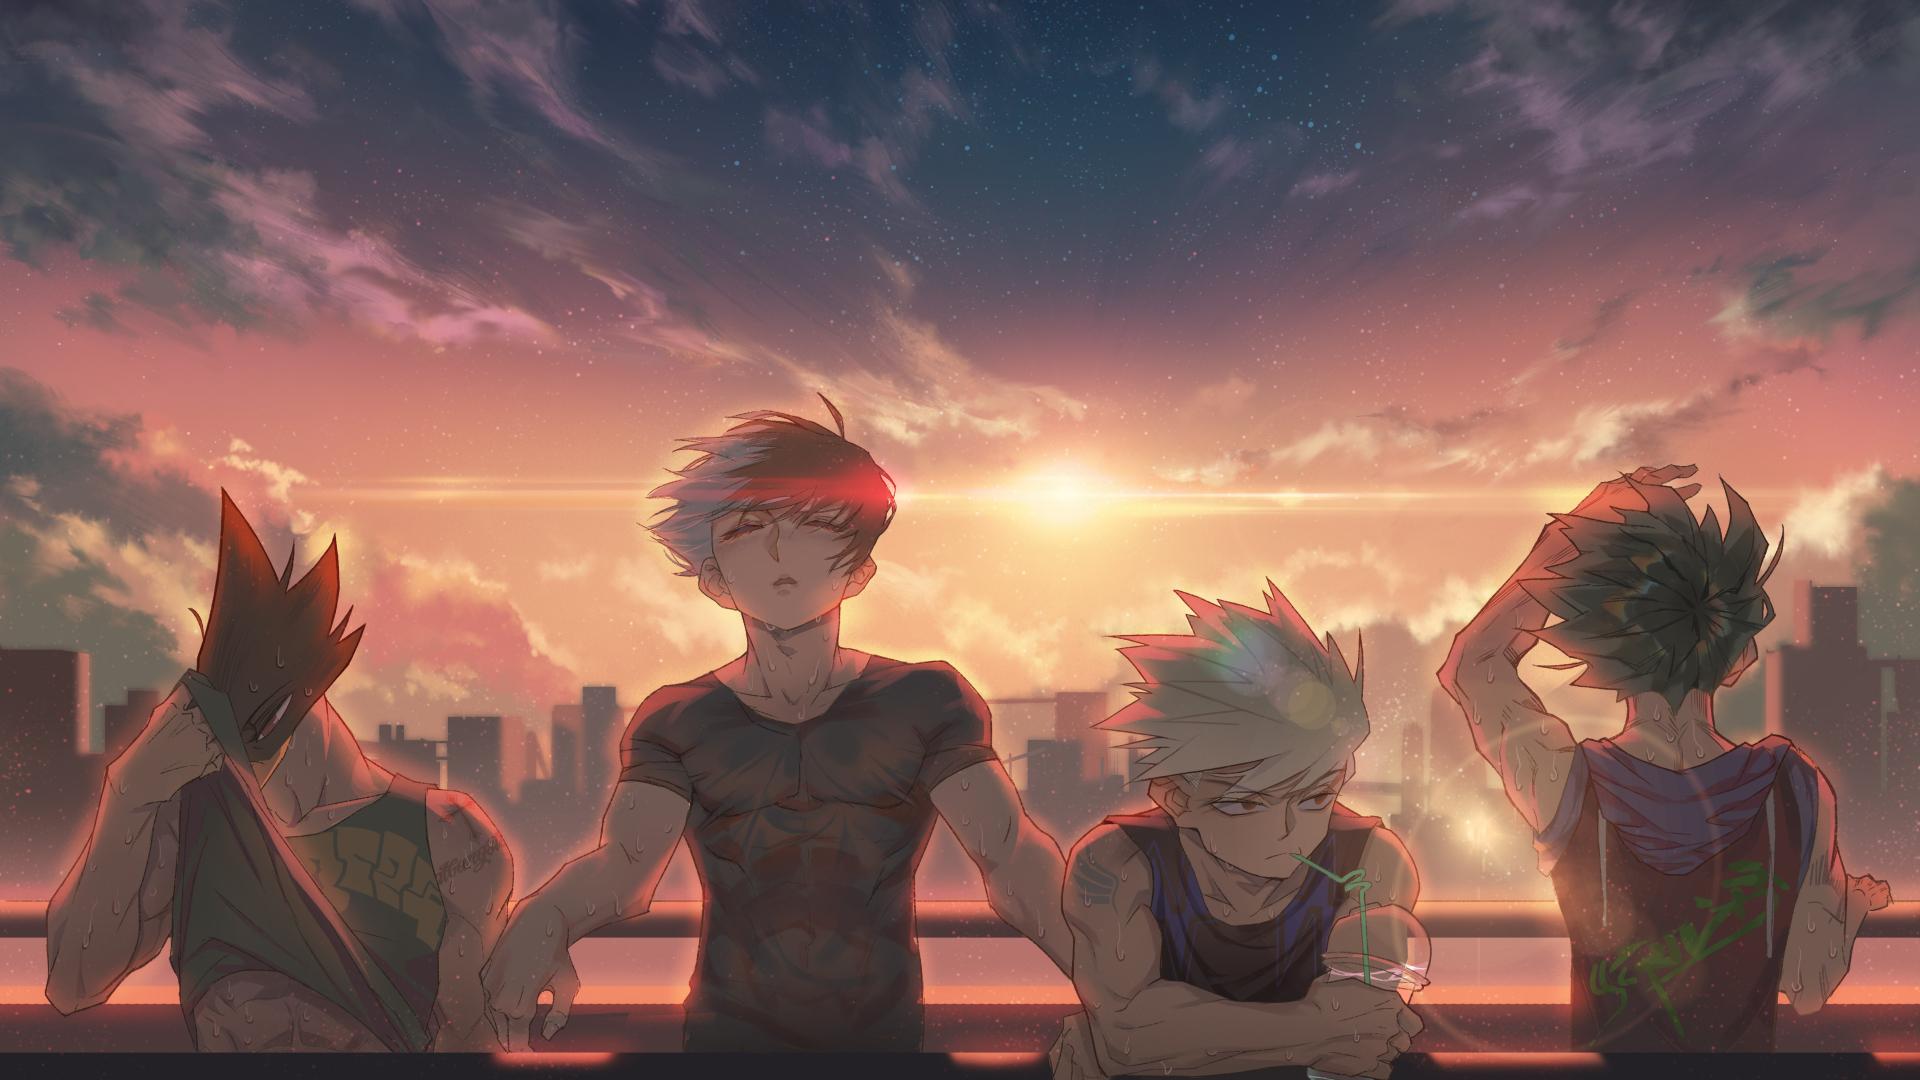 1080p Boku No Hero Academia Wallpaper Hd Anime Wallpapers